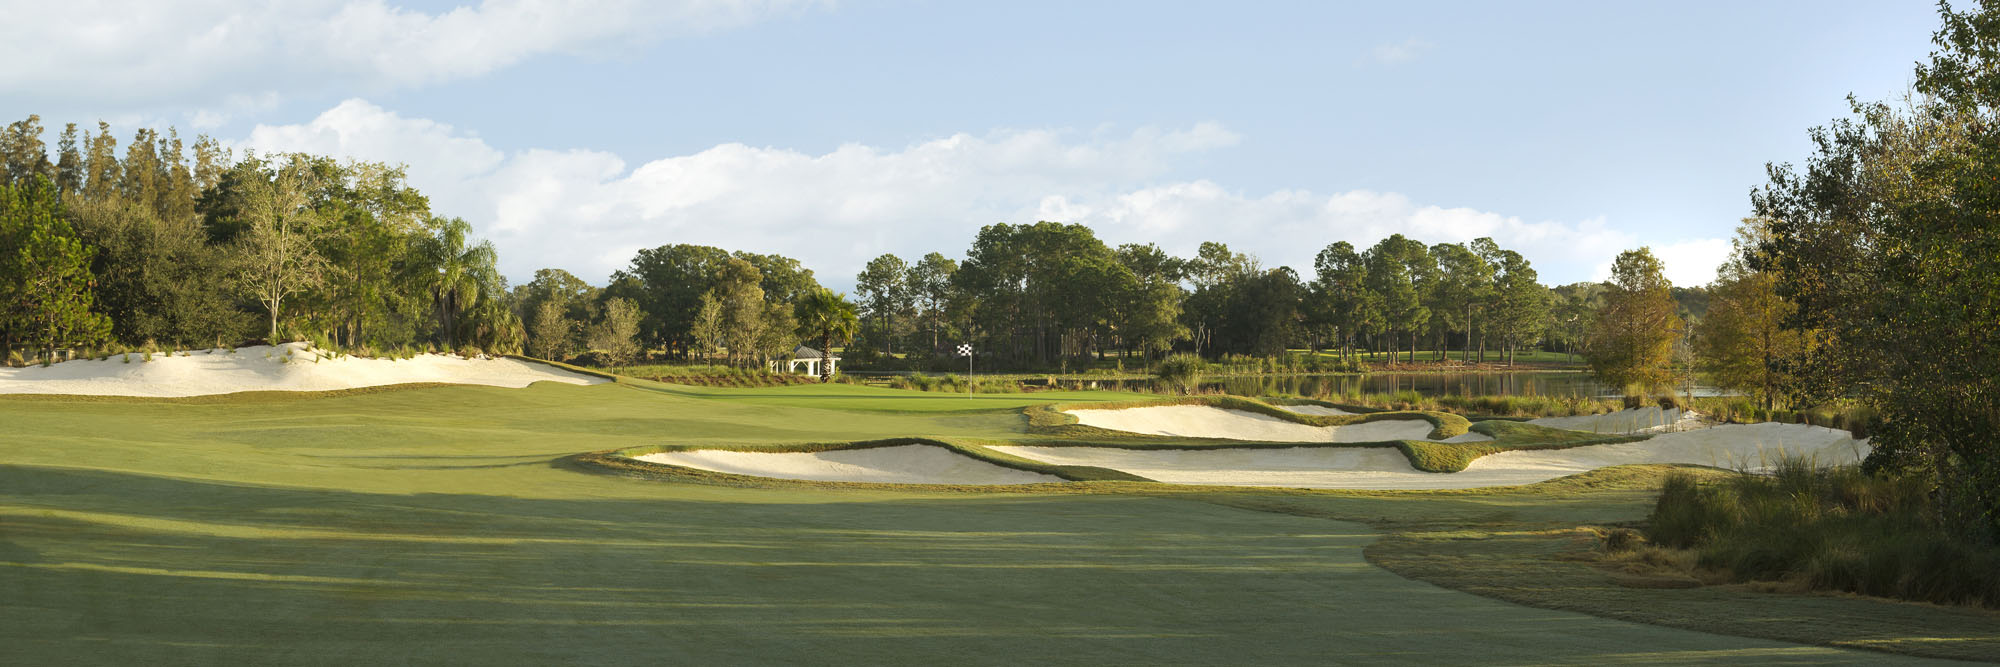 Golf Course Image - Old Memorial Golf Club No. 1